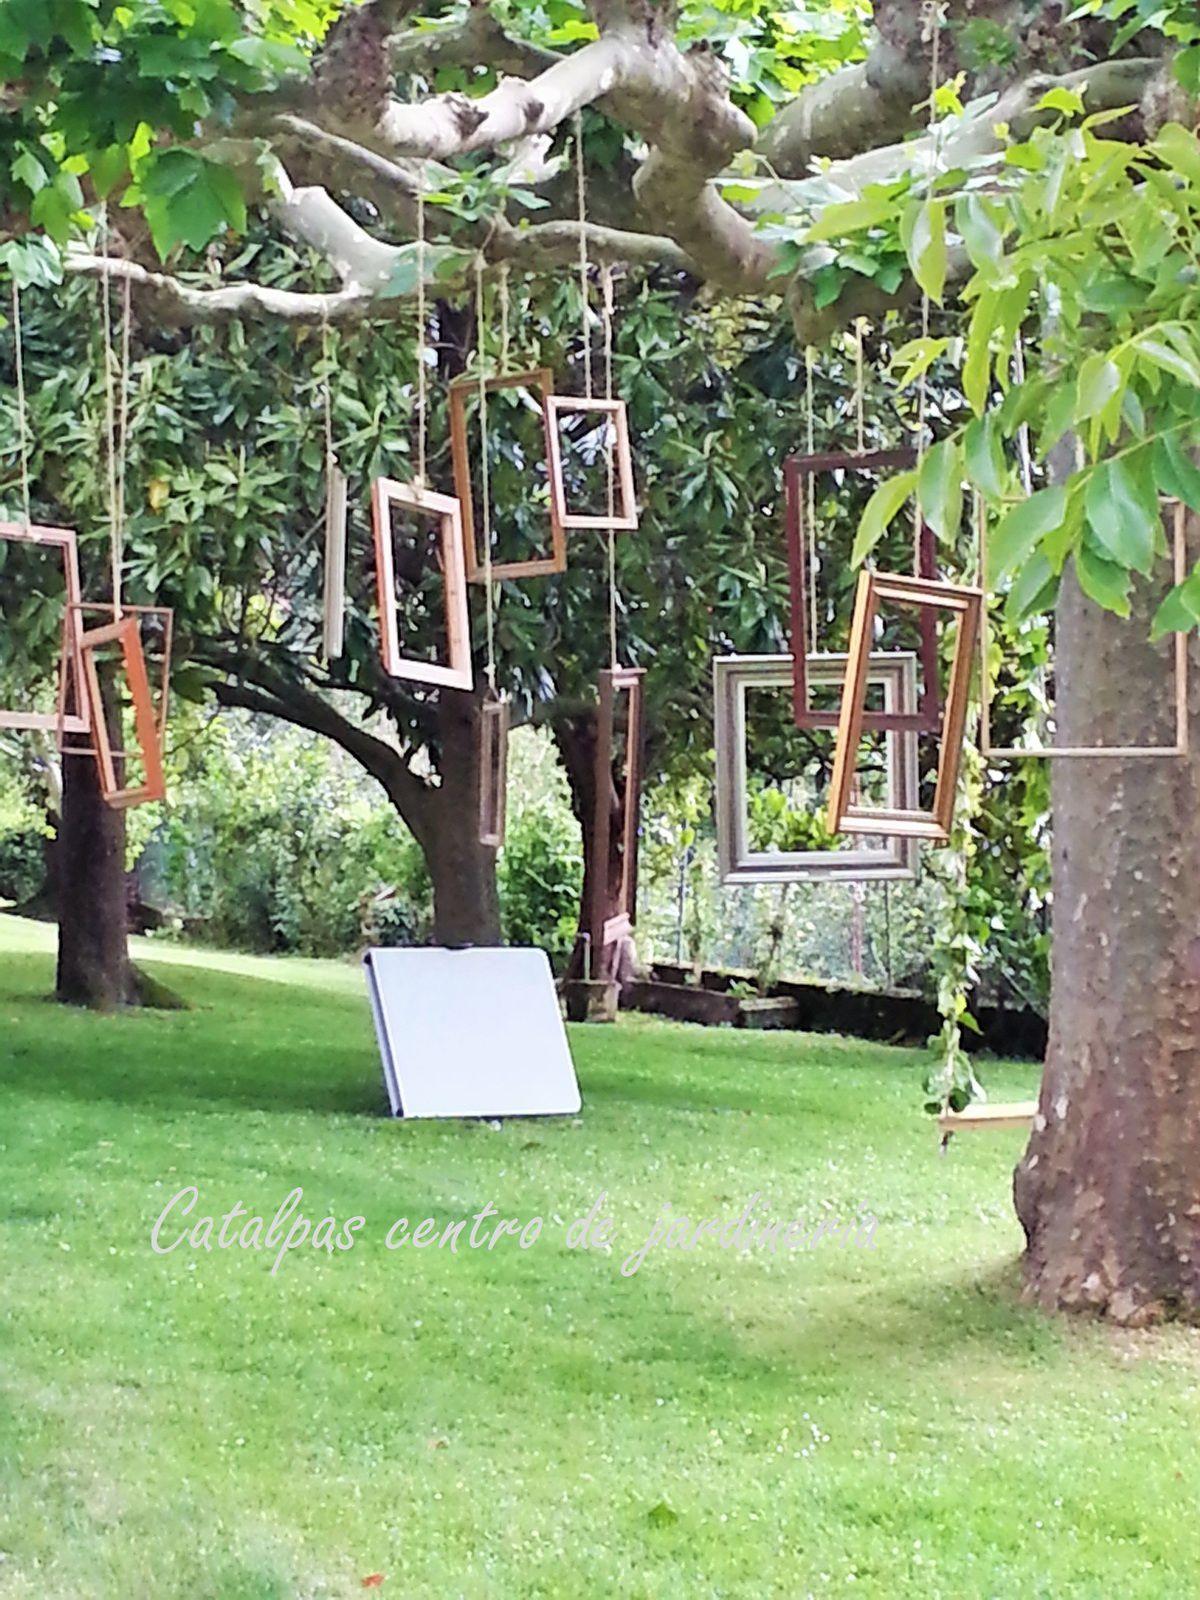 Detalle jardín - catalpas